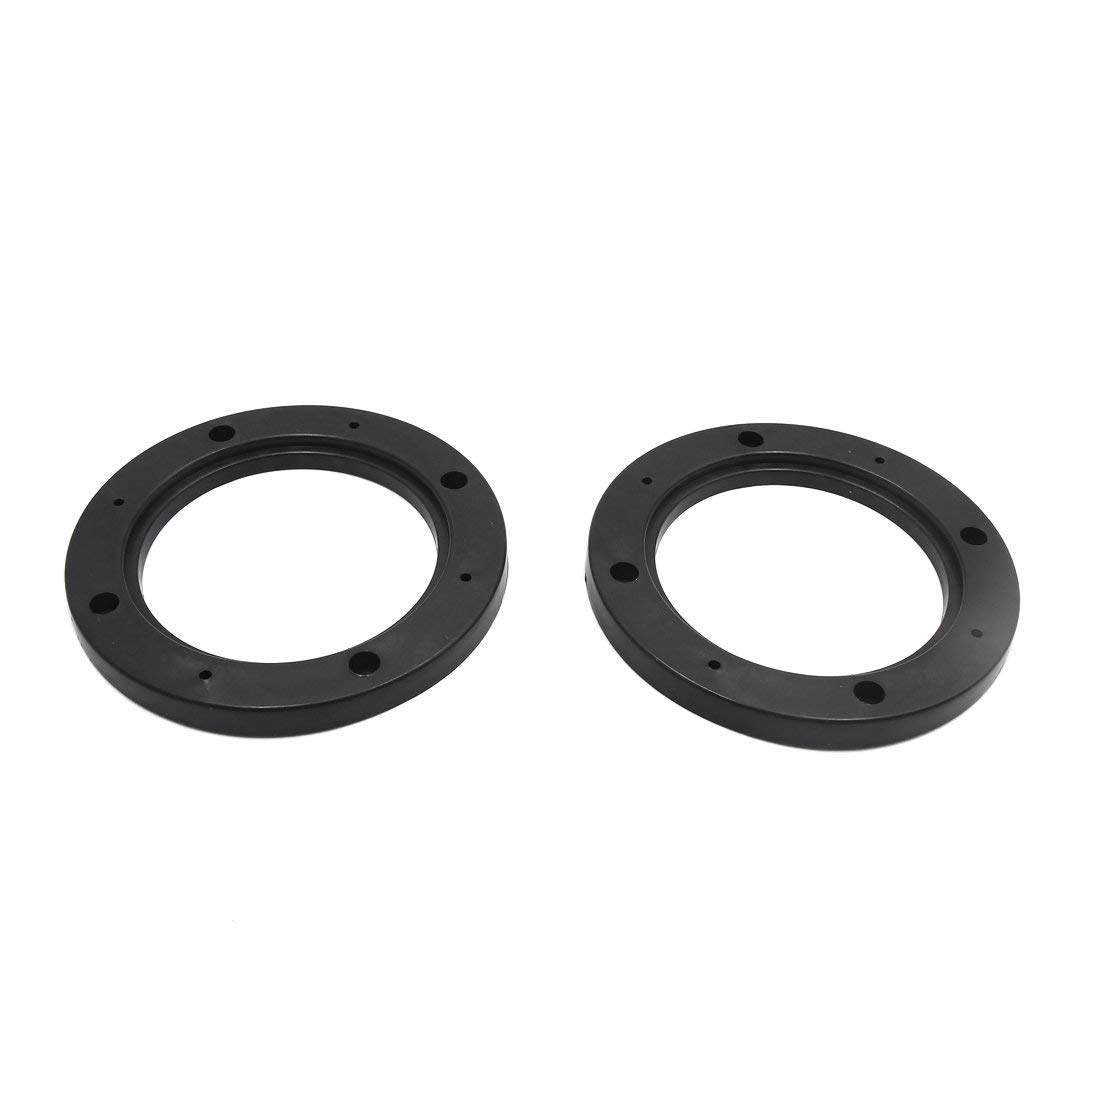 uxcell 2pcs Black 6.5 Car Stereo Audio Speaker Mounting Spacer Adaptor Rings for Honda